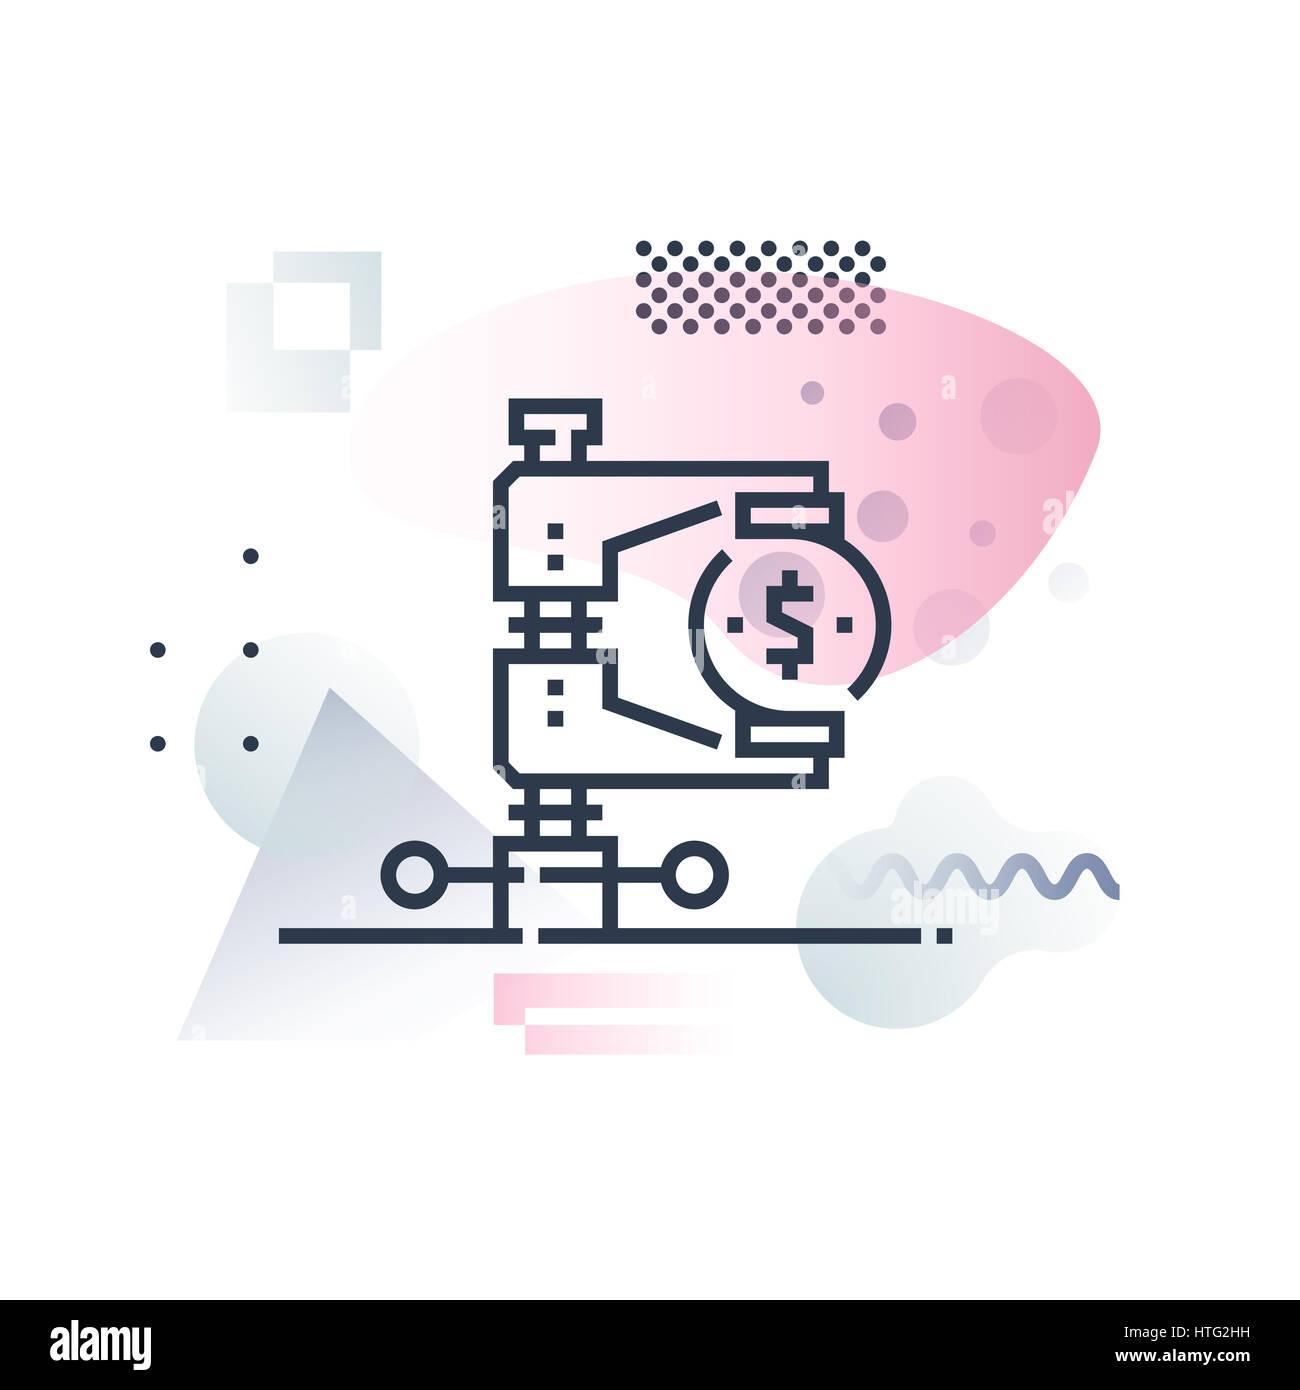 Tax regulation service, monetary legislation pressure. Abstract illustration concept. - Stock Image